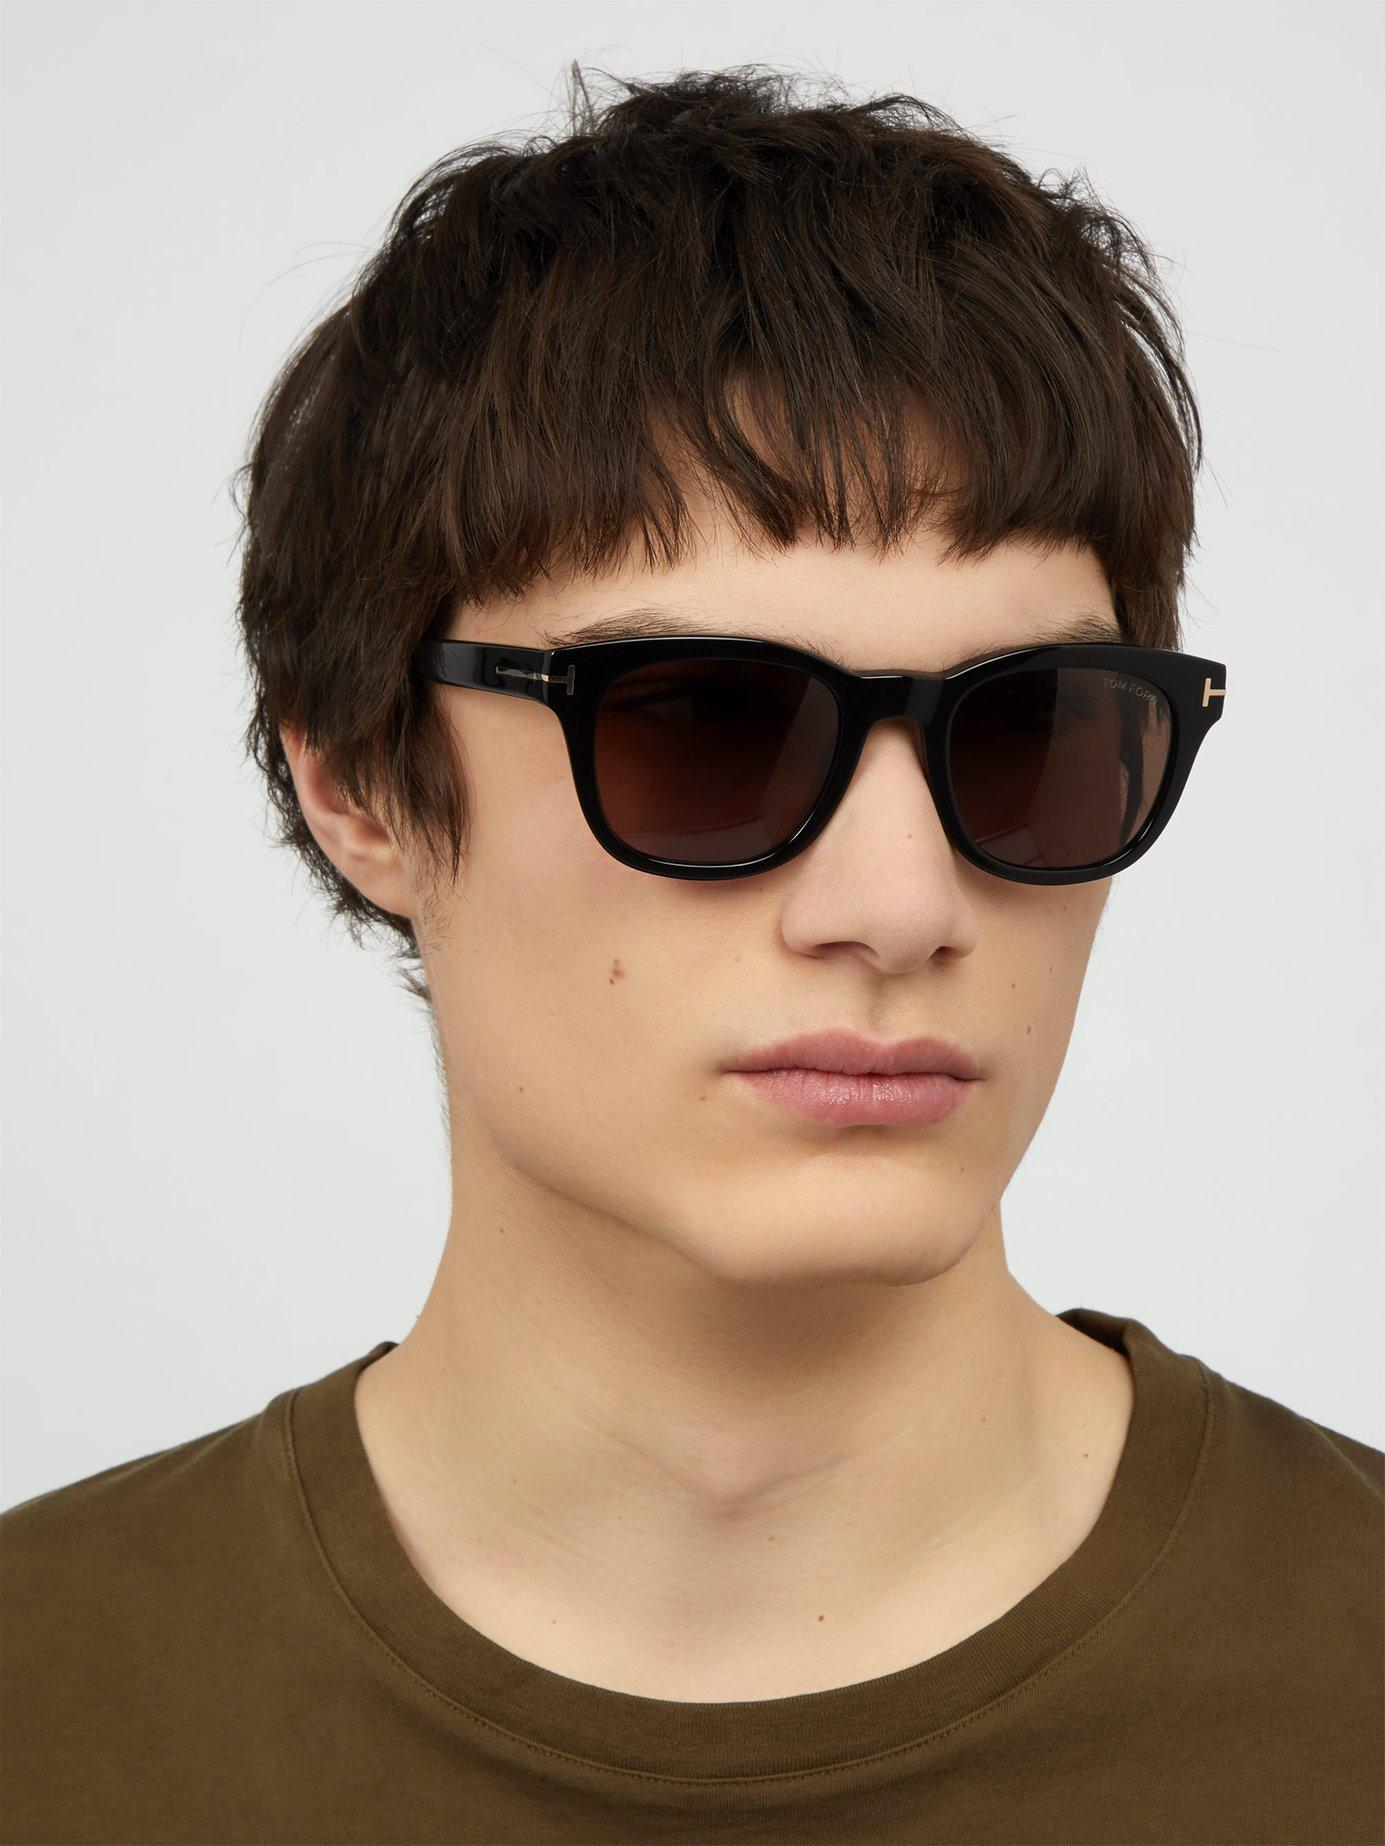 96a1f12efda Lyst - Tom Ford Eugenio Round Frame Acetate Sunglasses in Black for Men